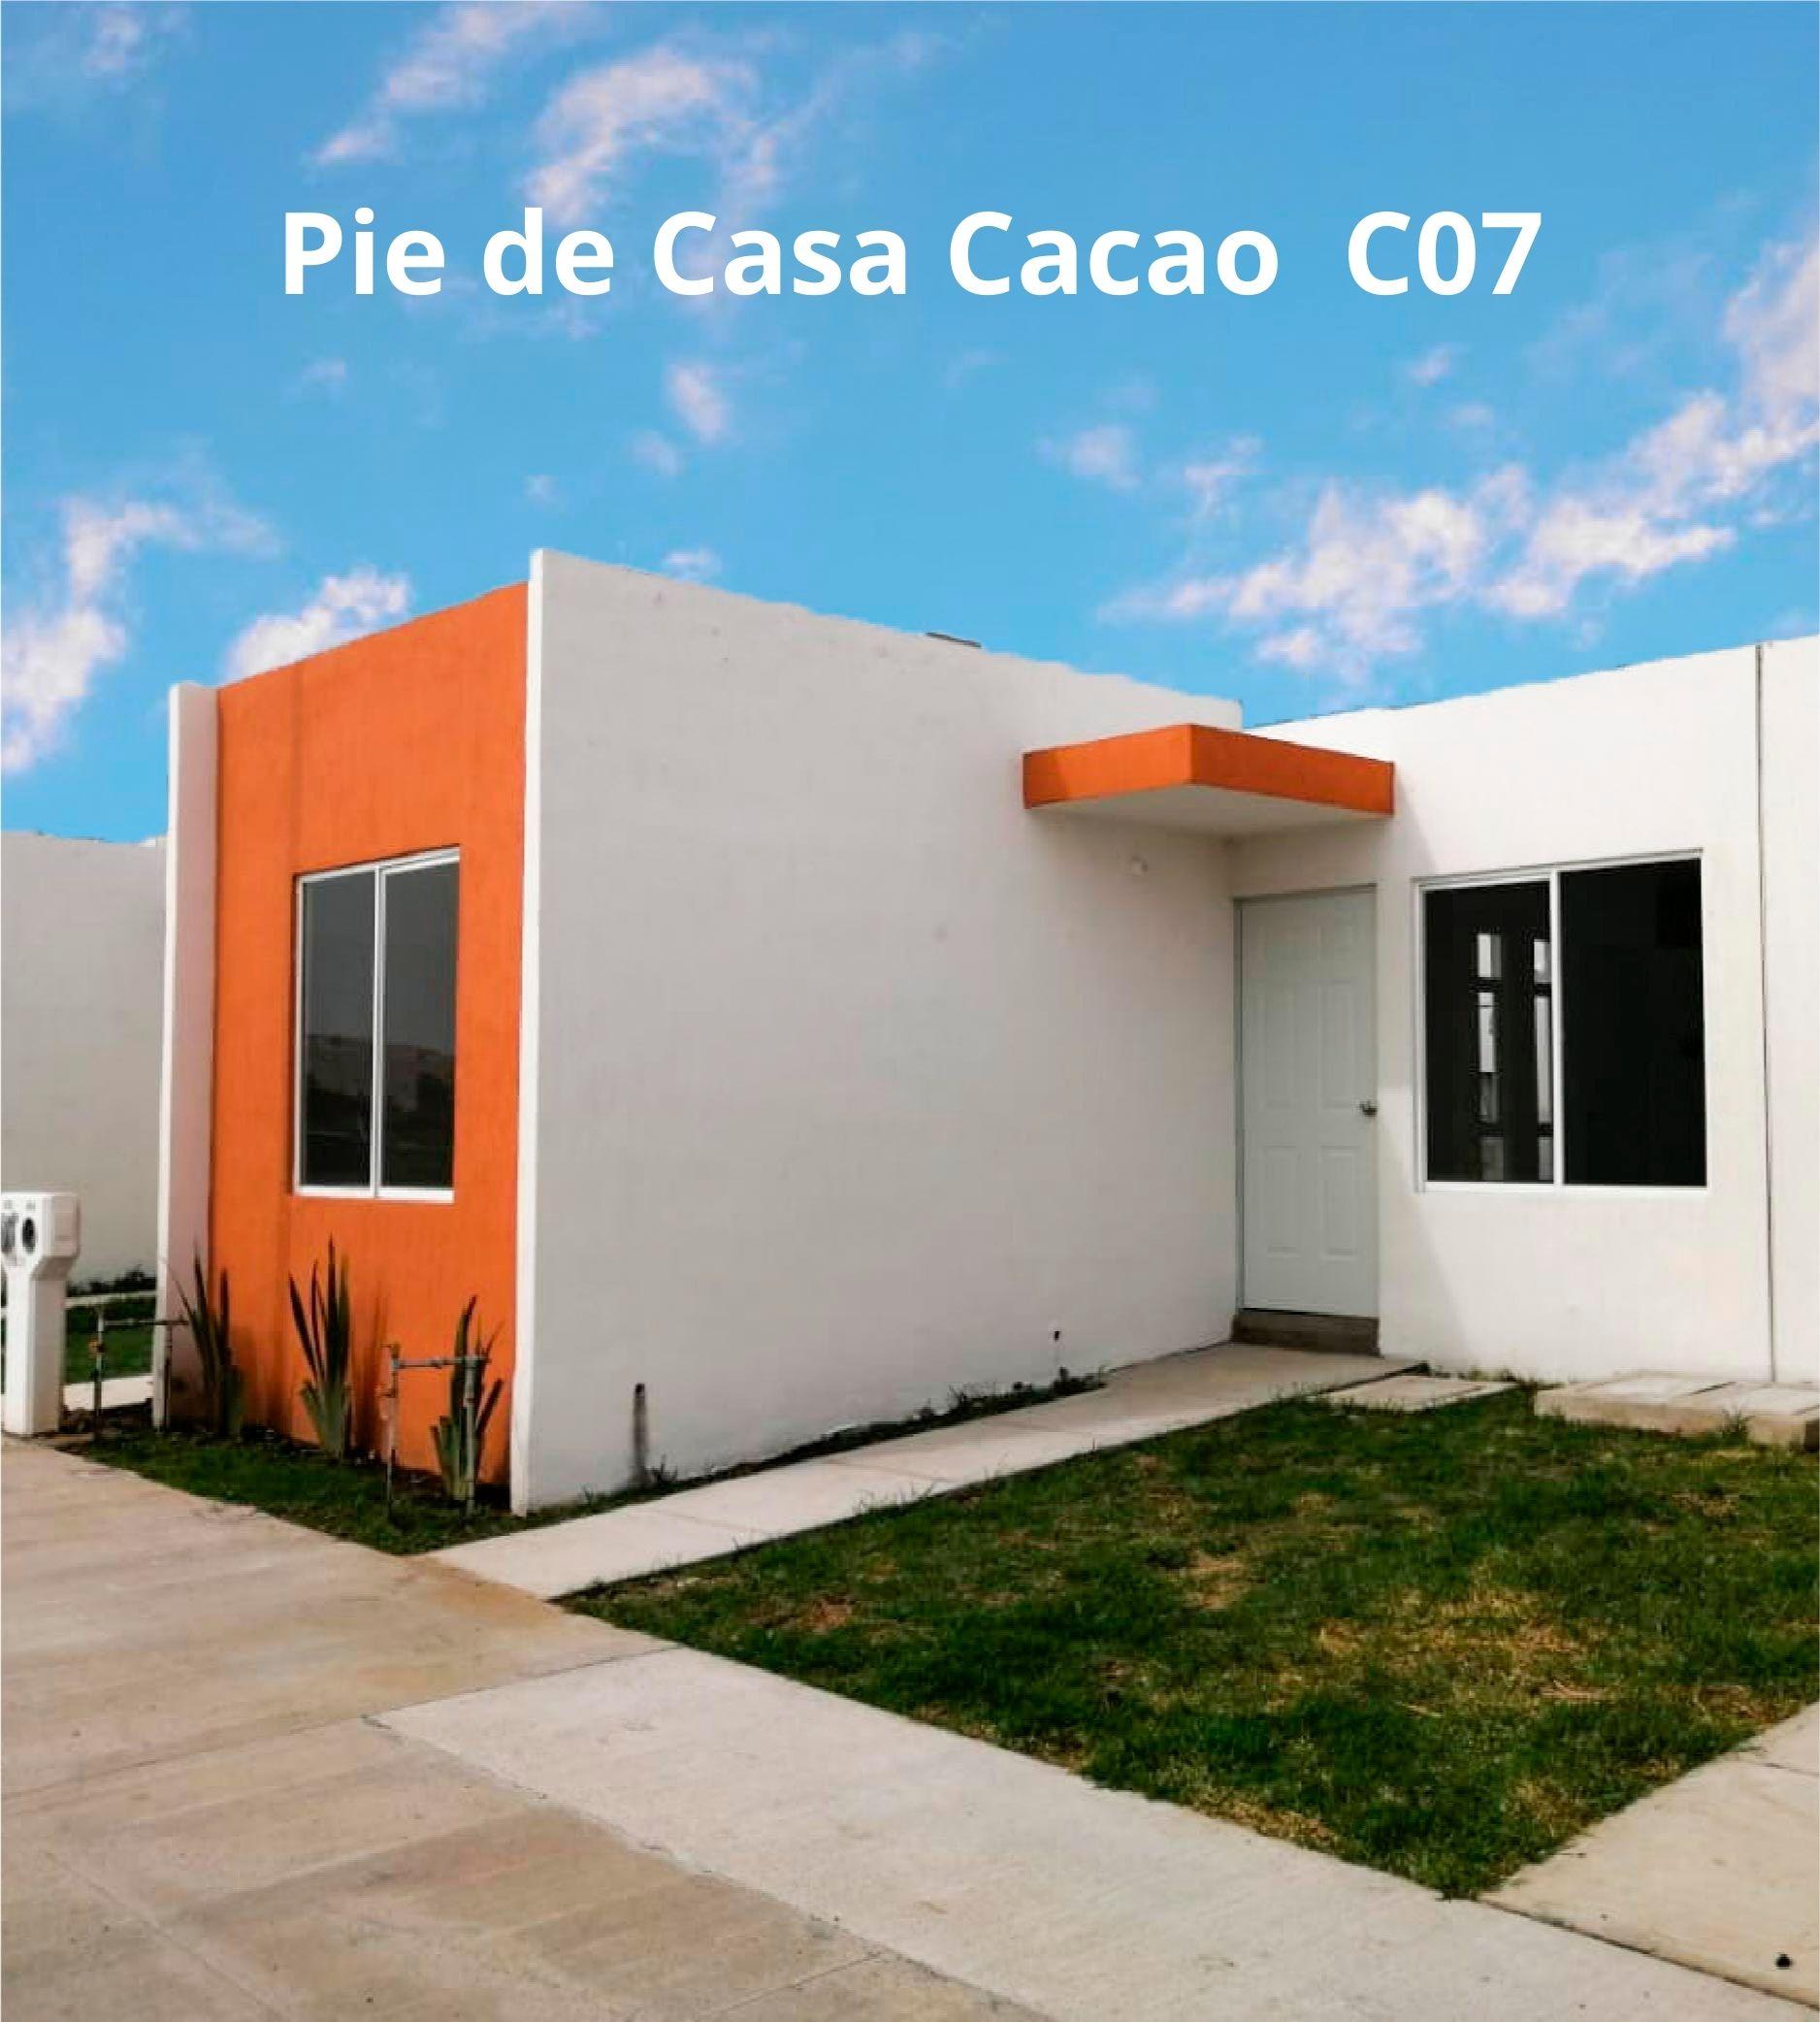 Pie de Casa Cacao C07